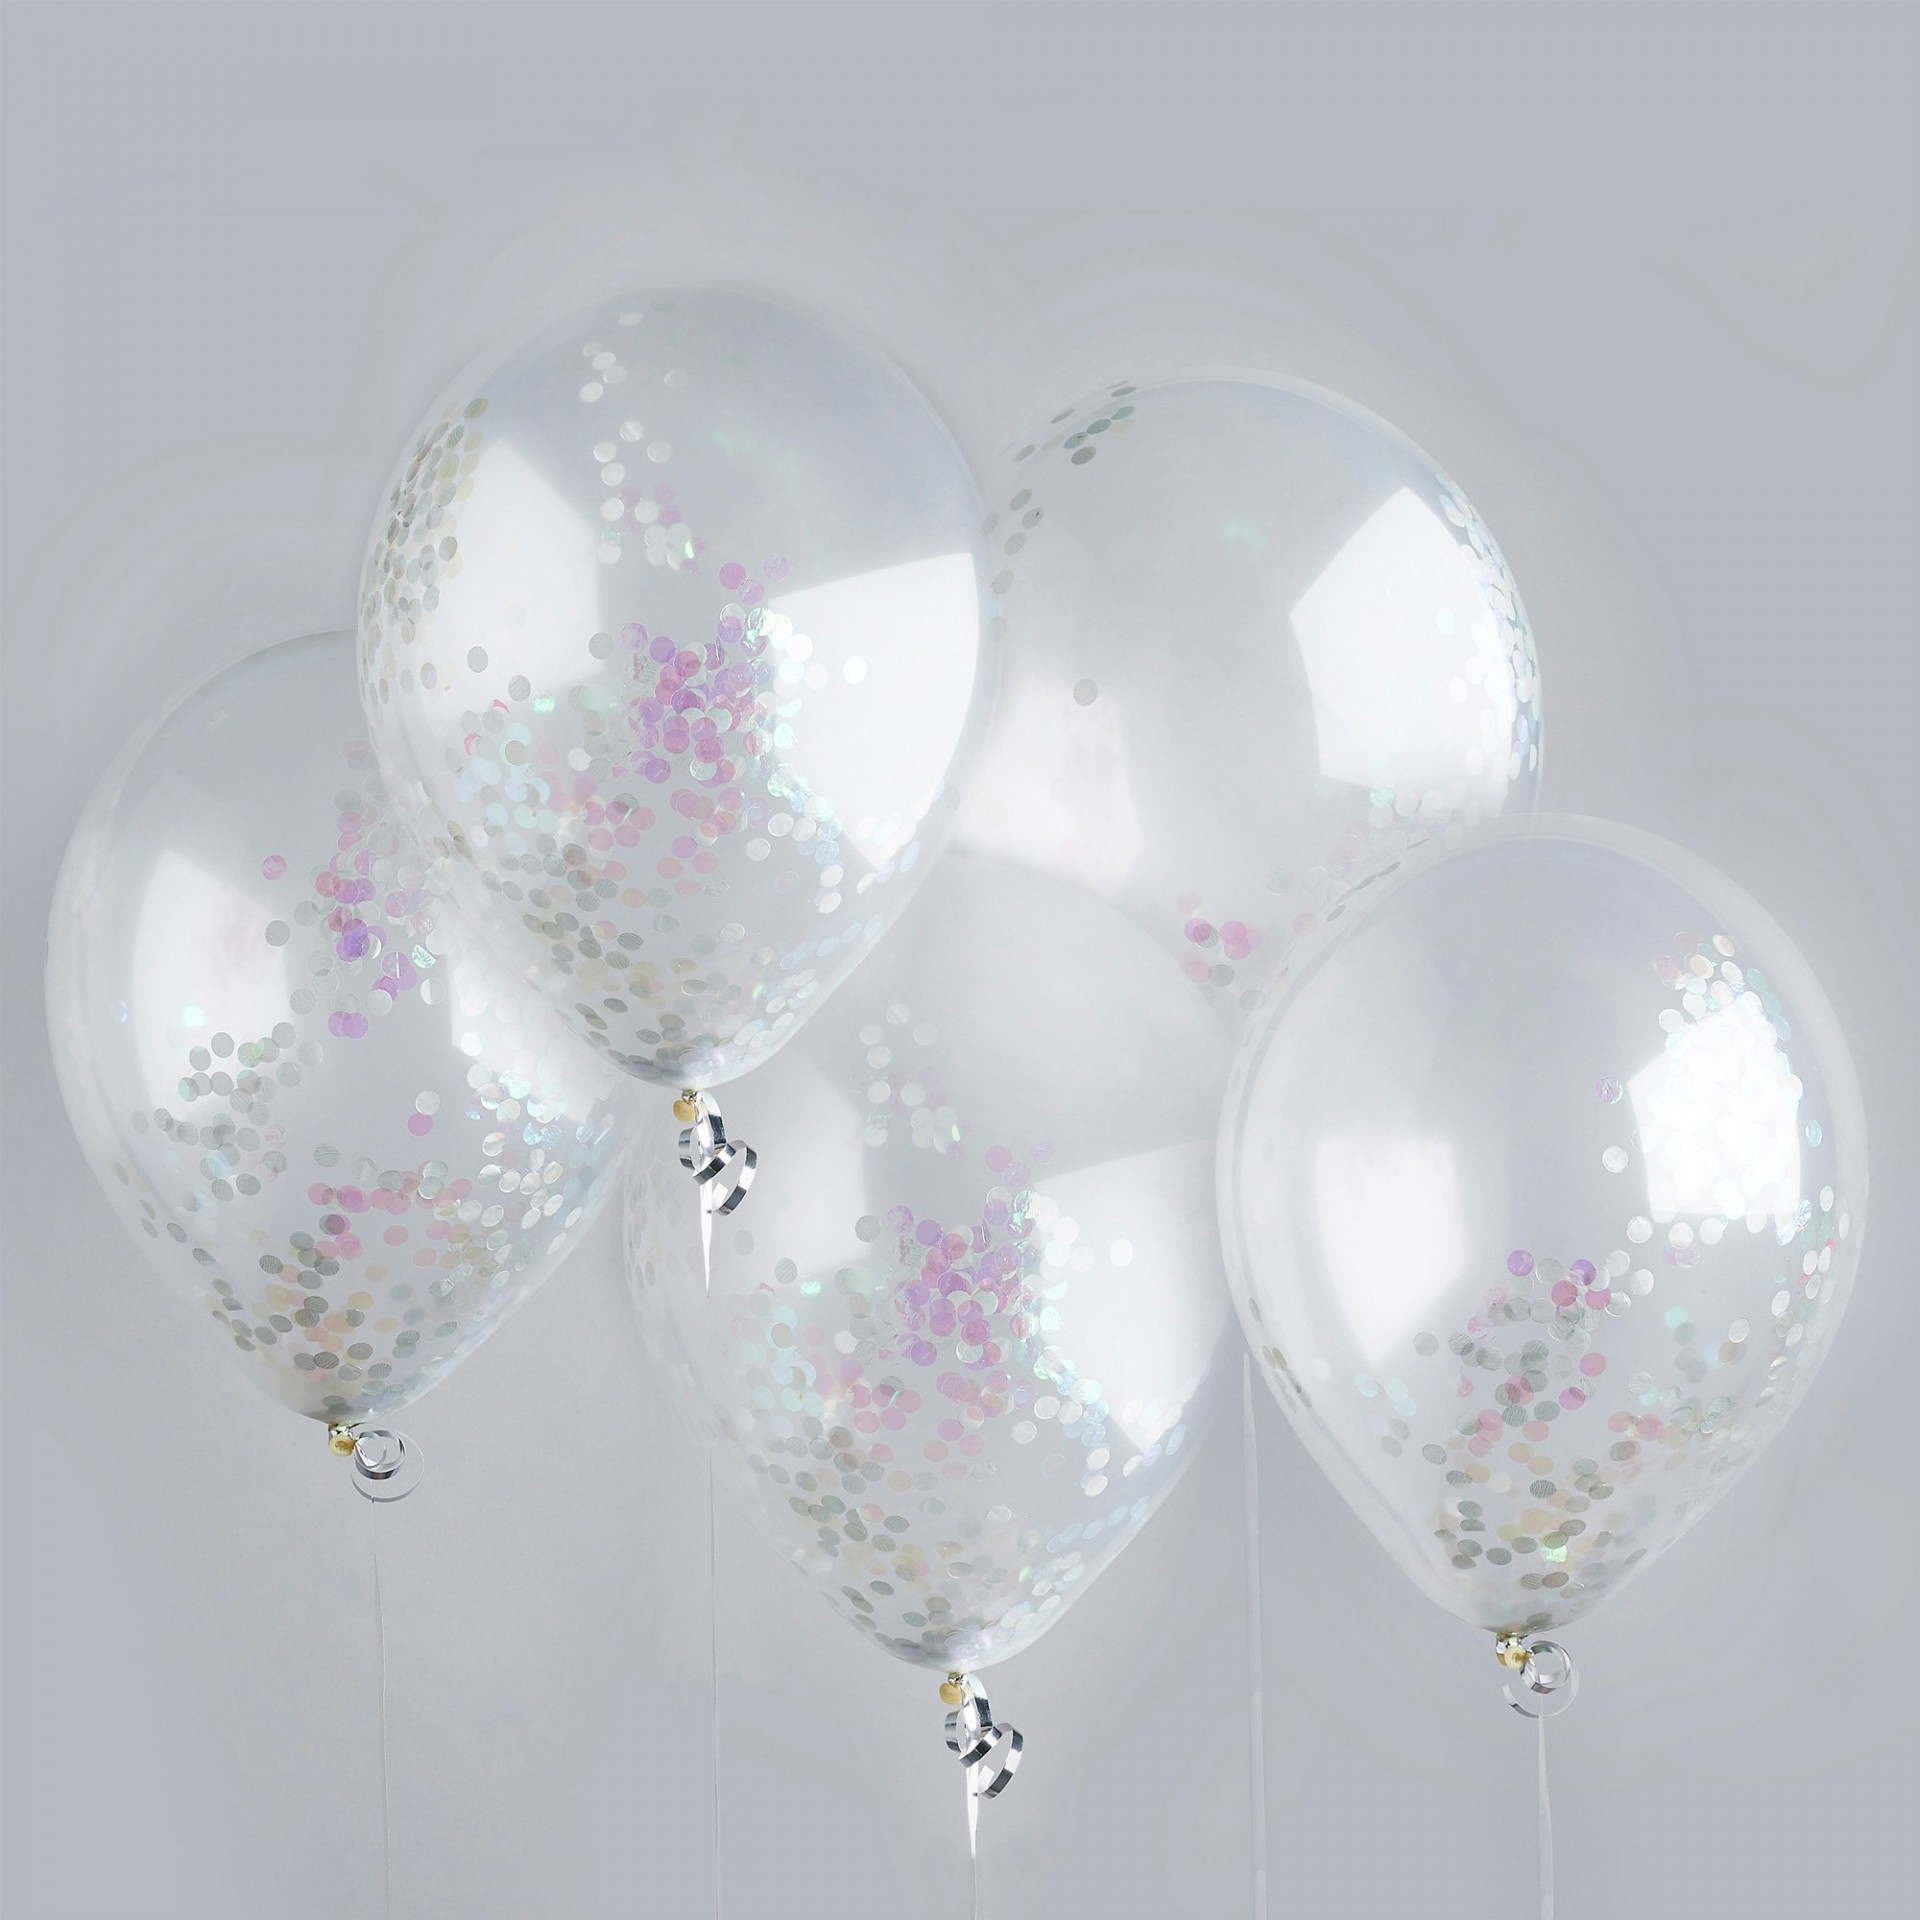 Balões Confetti - Irresdiscente,pk/5